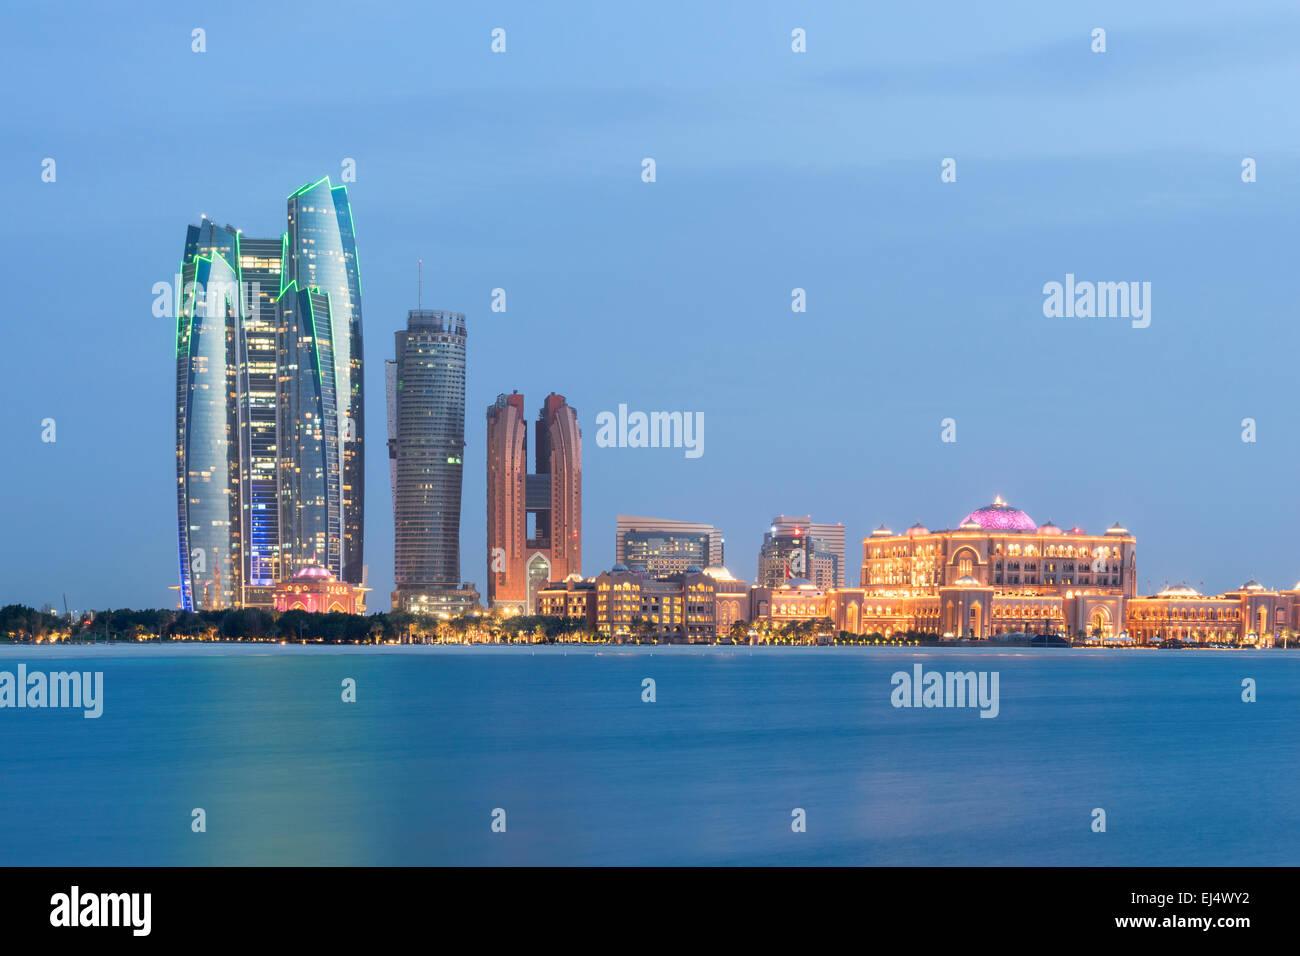 Skyline serale vista di Abu Dhabi negli Emirati Arabi Uniti Immagini Stock